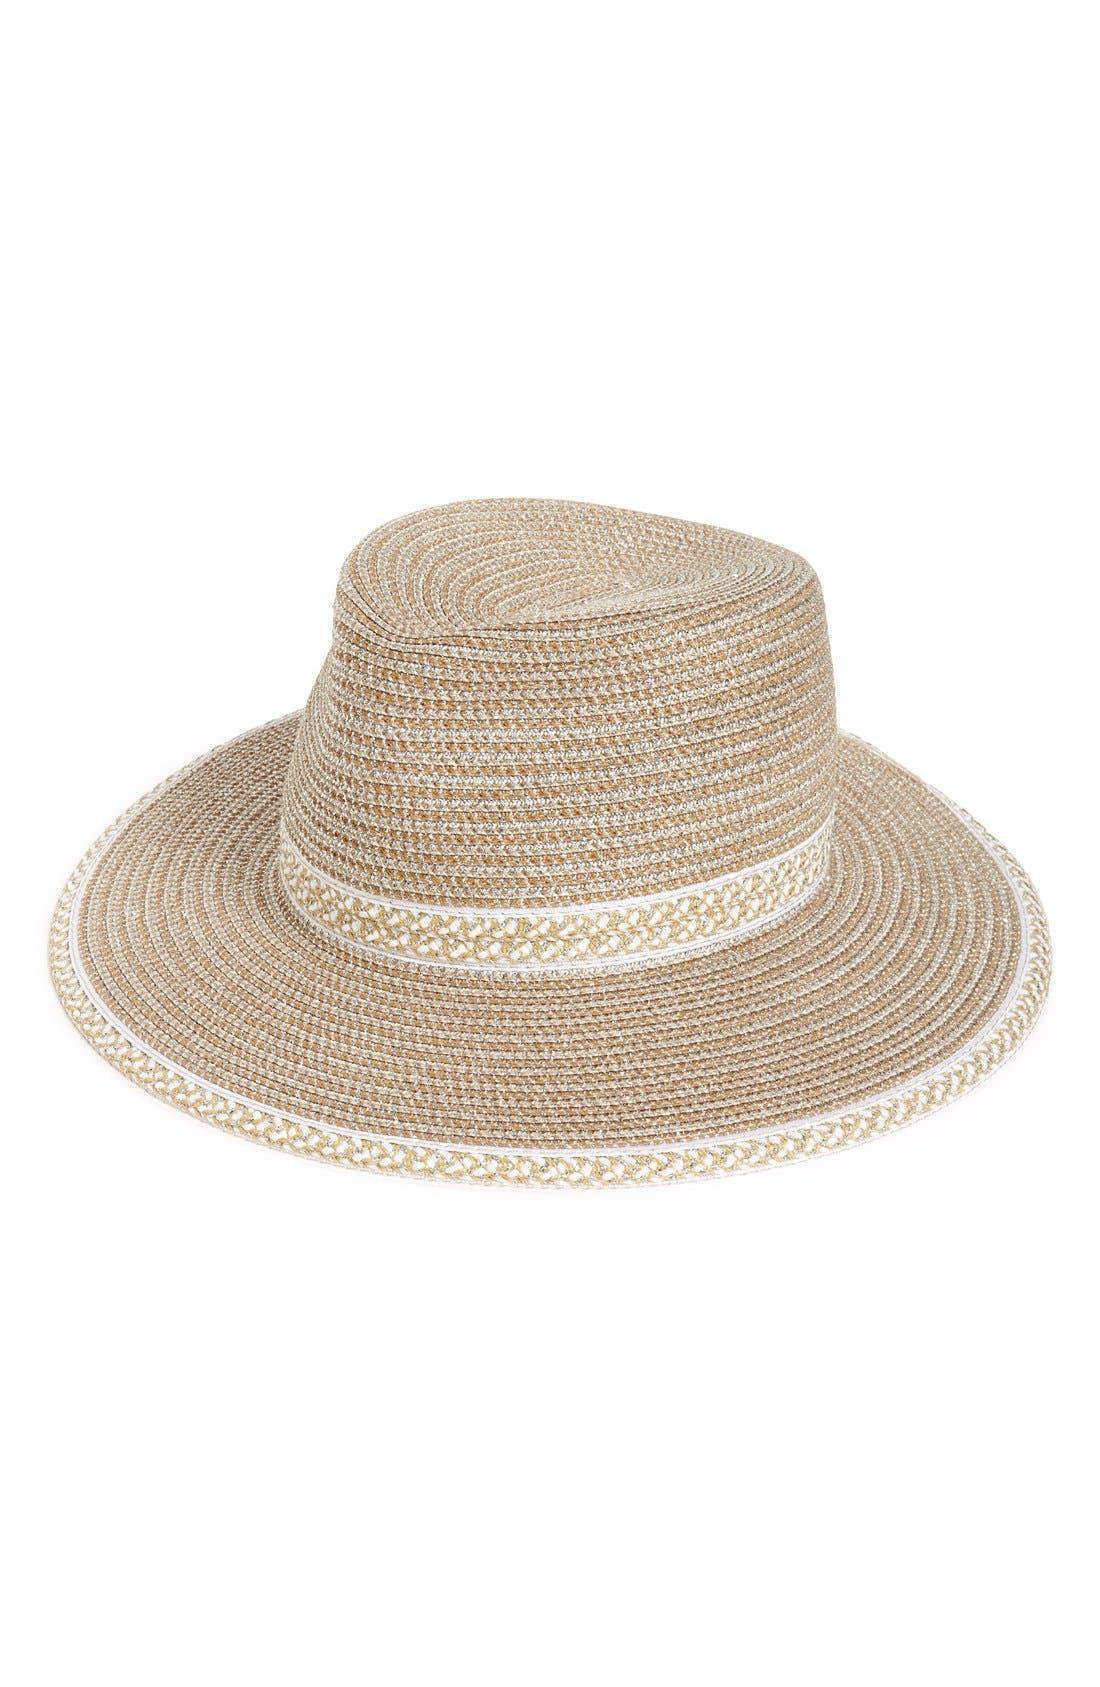 'Georgia' Woven Hat,                             Main thumbnail 1, color,                             100